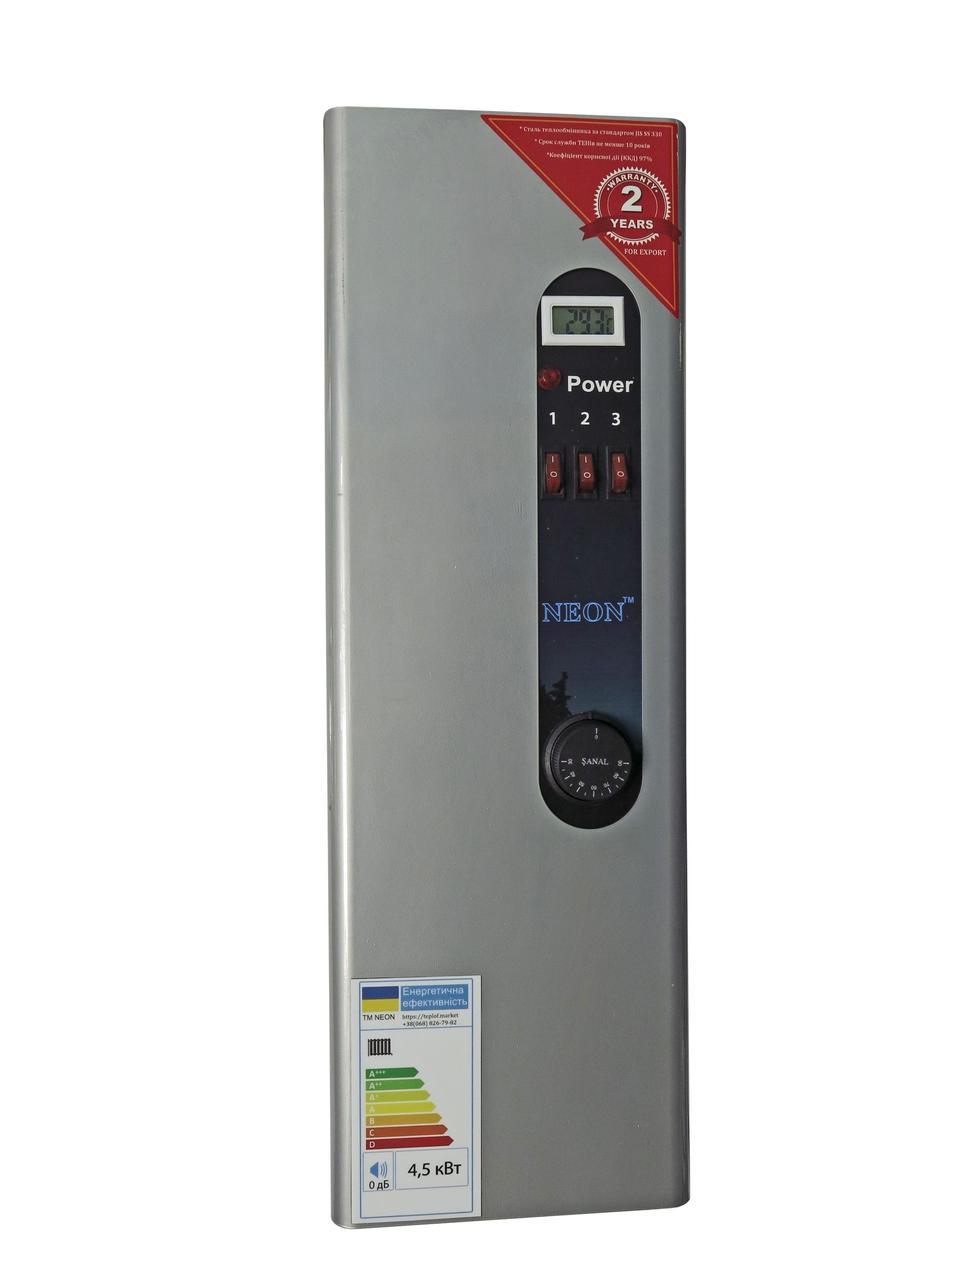 Електричний котел NEON WCS 9.0 кВт, 220/380 В, модульний контактор